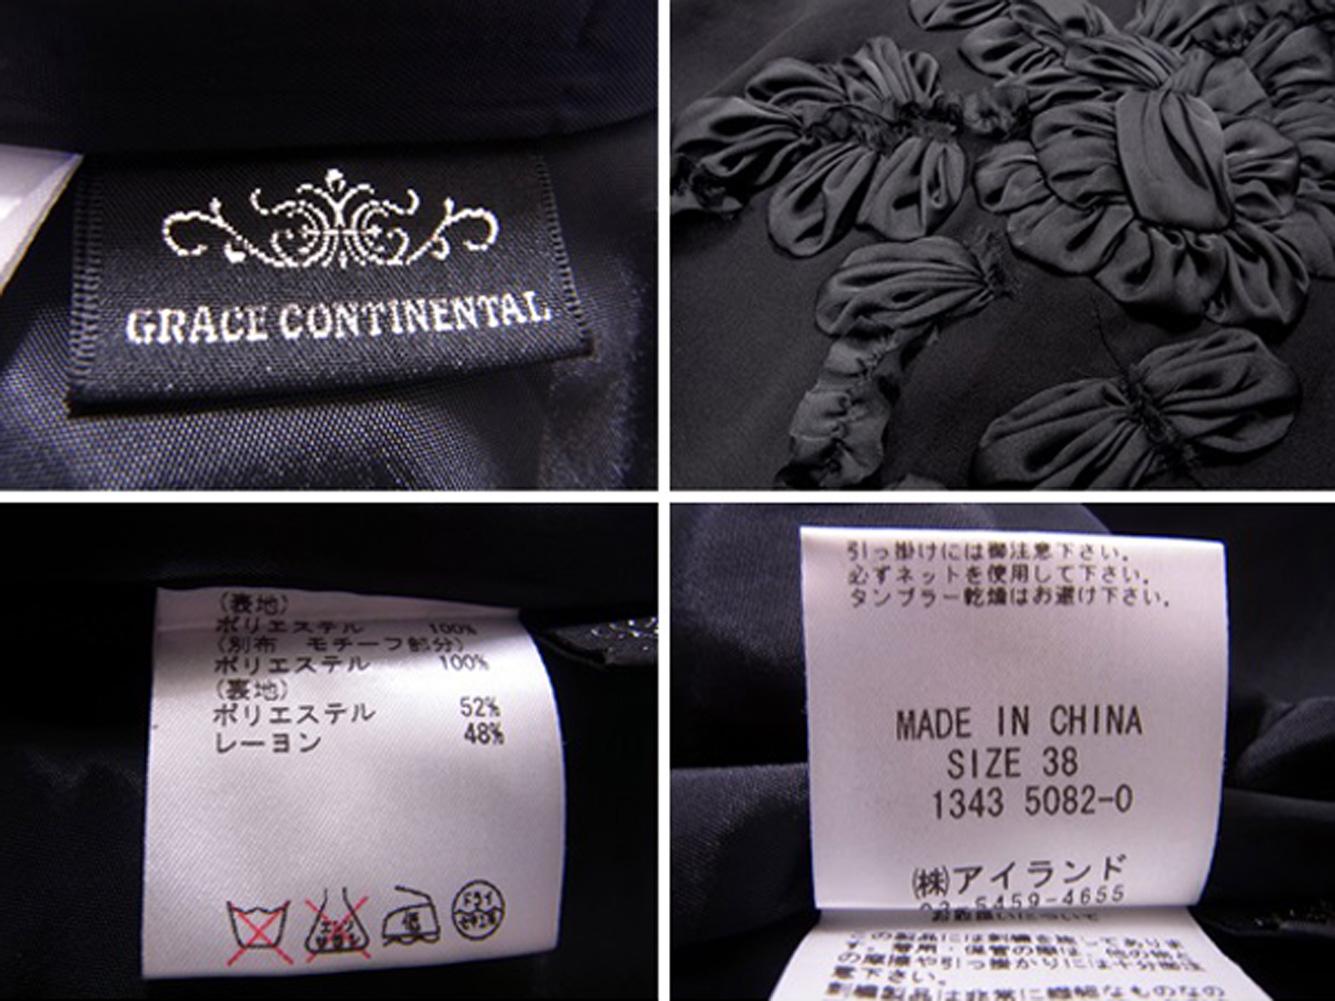 cfc226873fef クルーネック ♯38サイズ レディース 袖口&裾フリル ワンピース ...